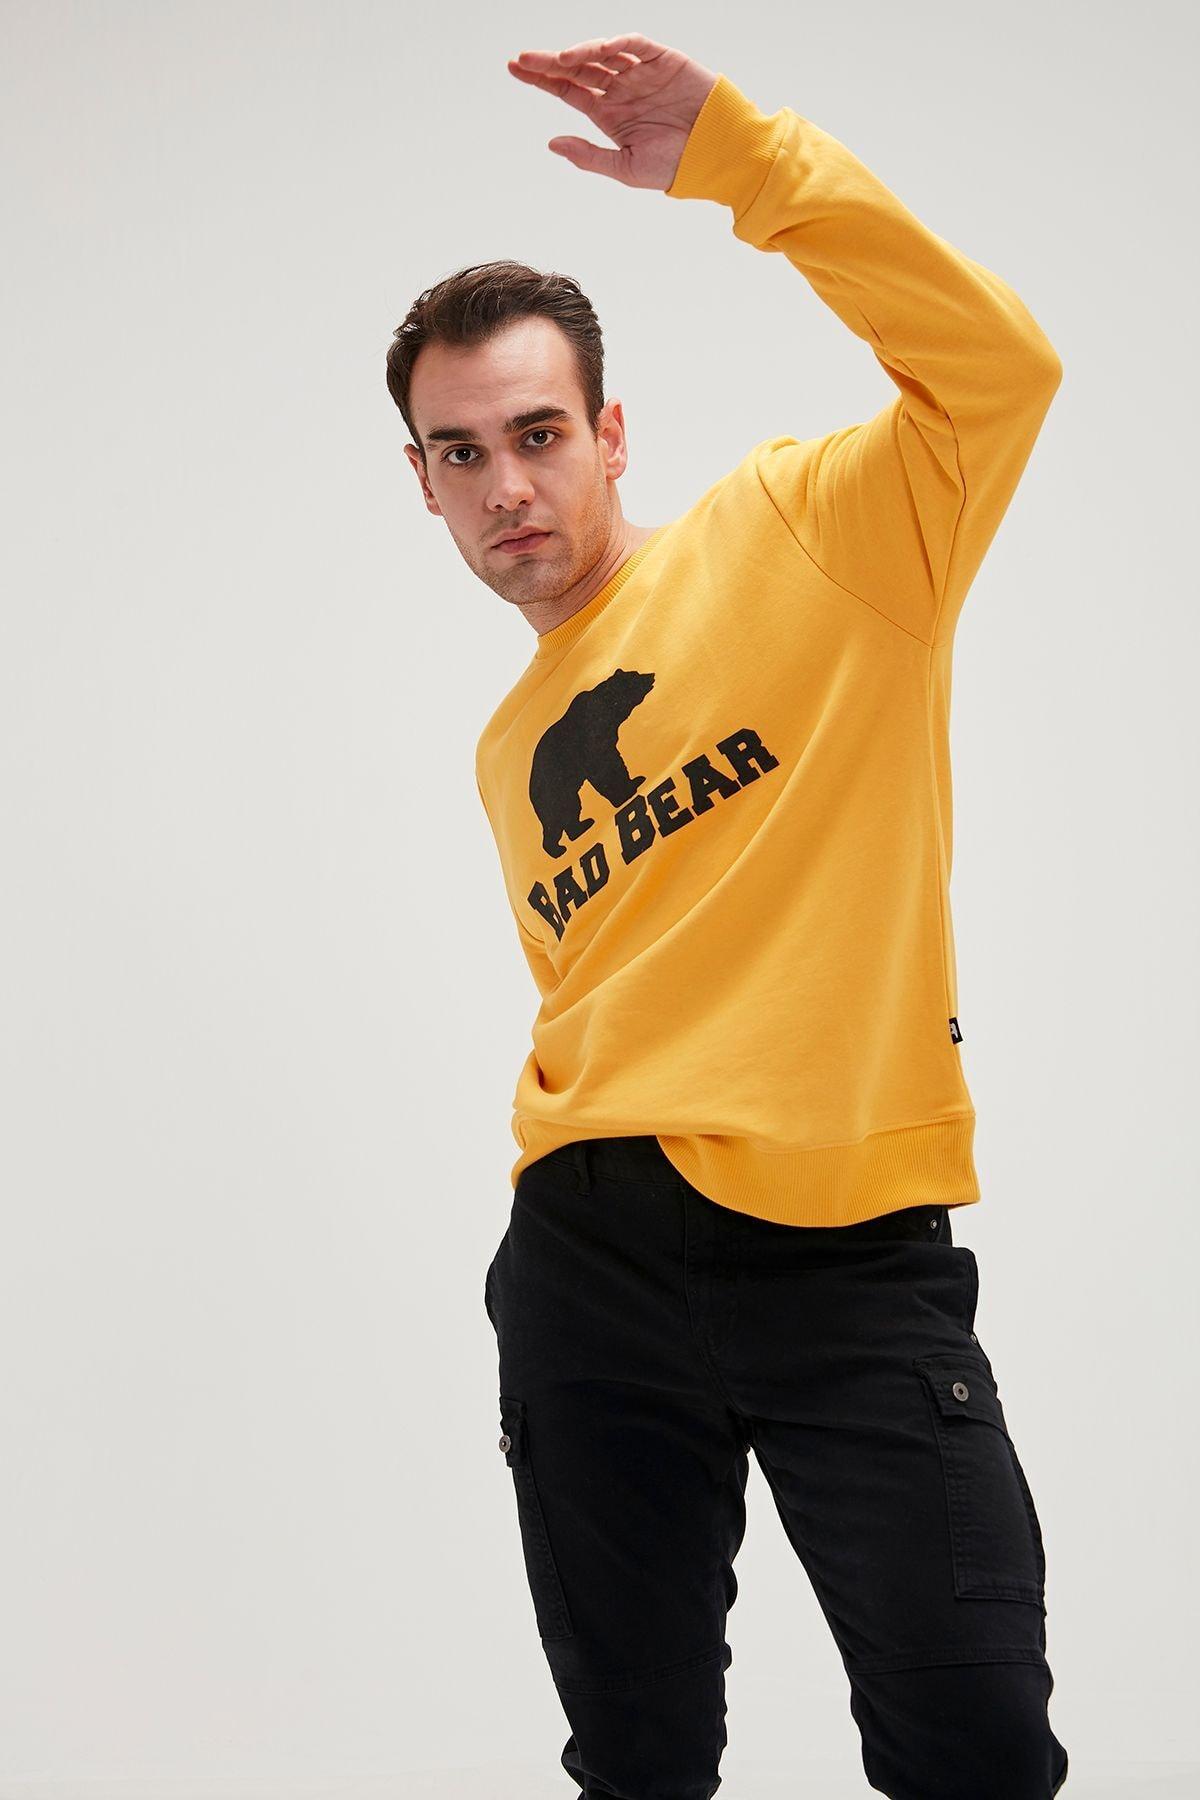 Bad Bear Crewneck Erkek Sweatshirt 20.02.12.011mustard 1